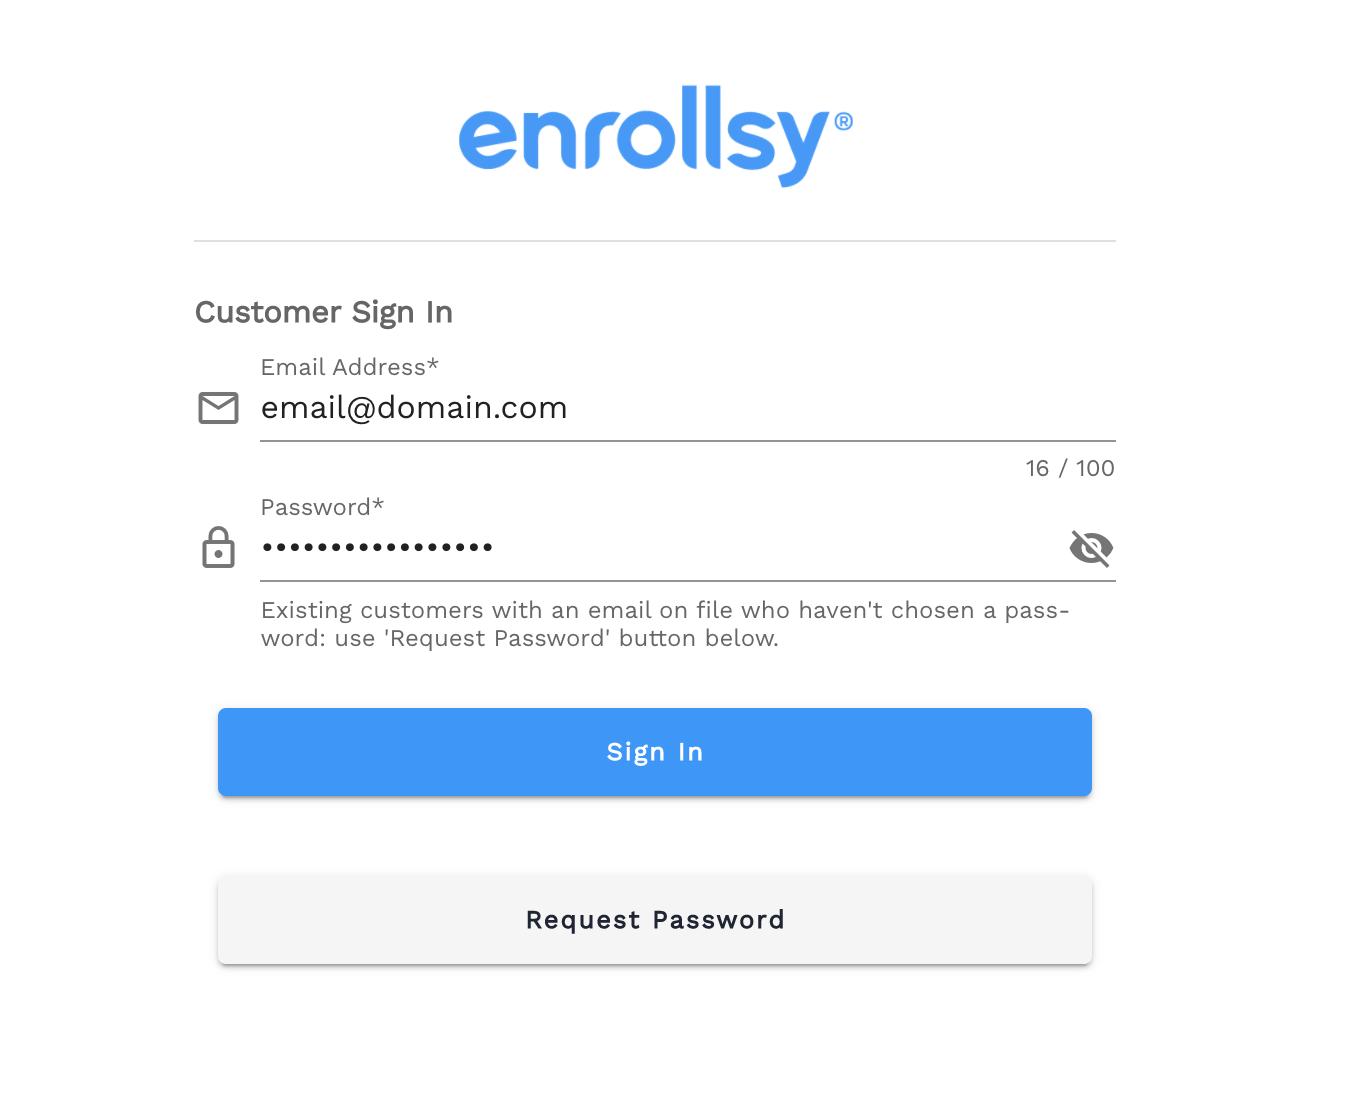 Enrollsy customer portal login